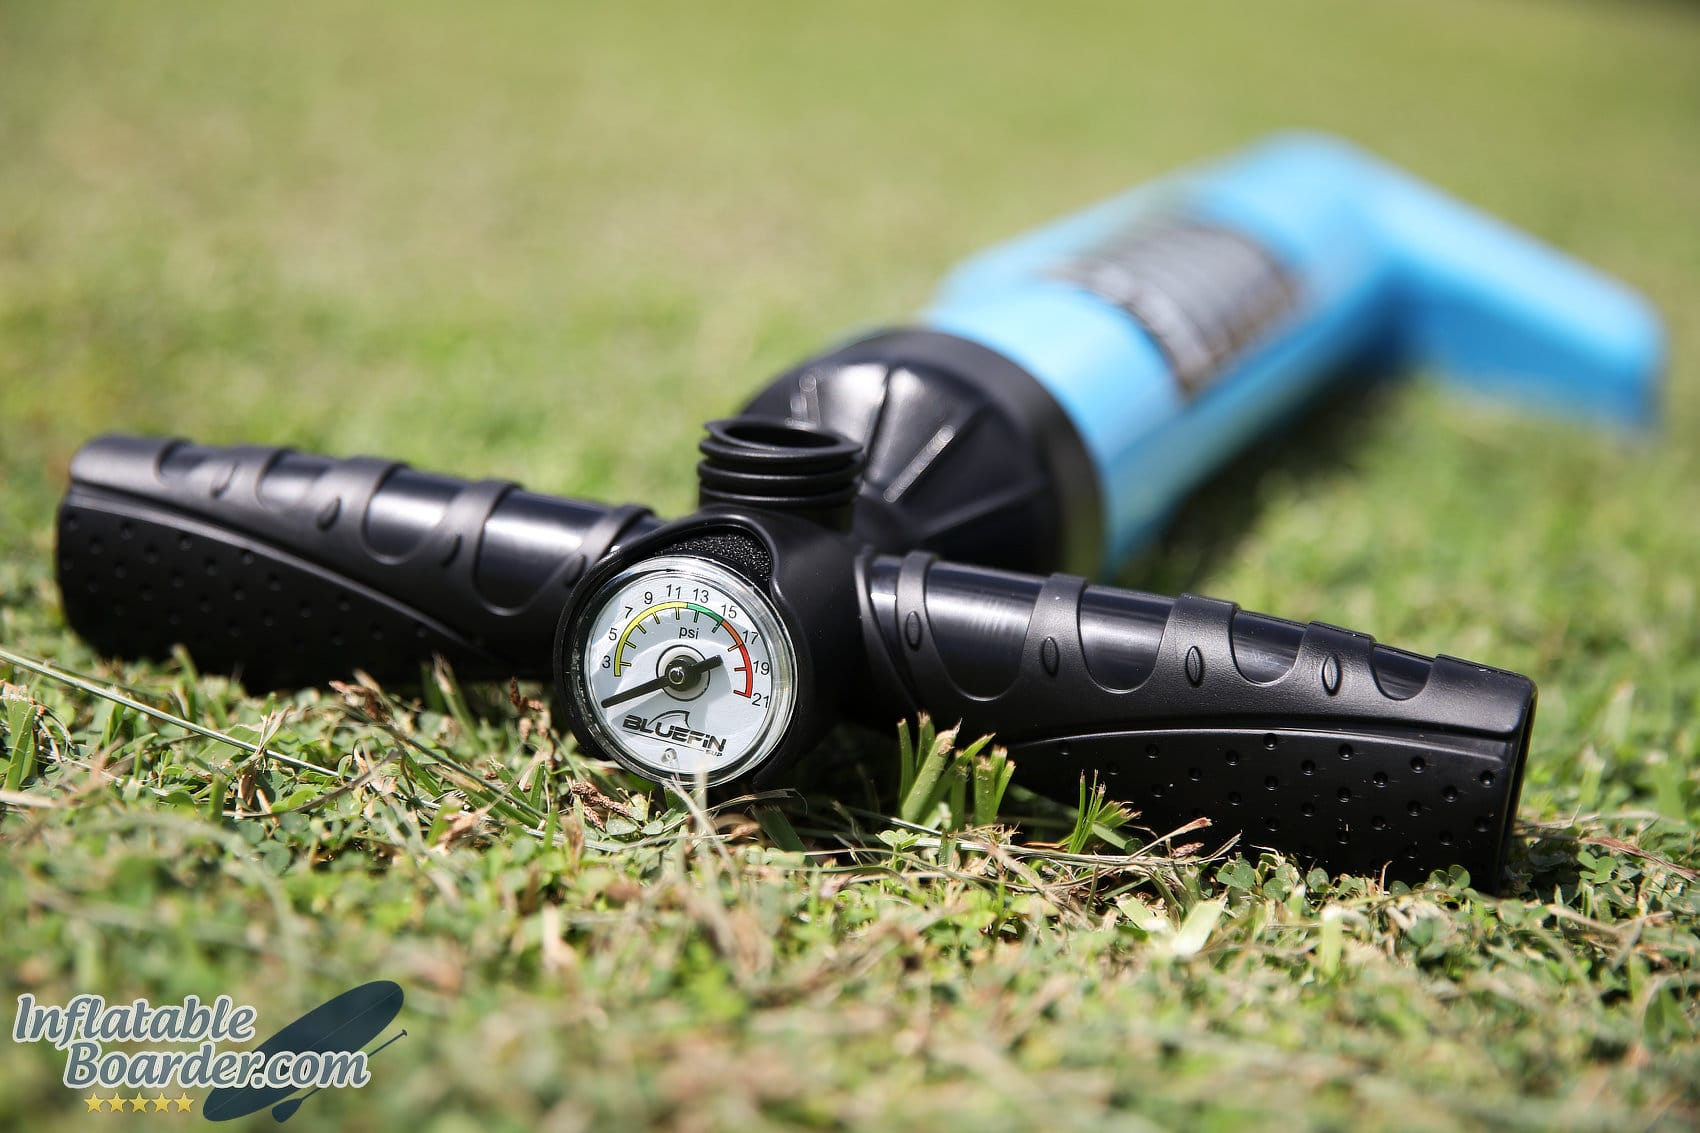 Bluefin Double Action Pump